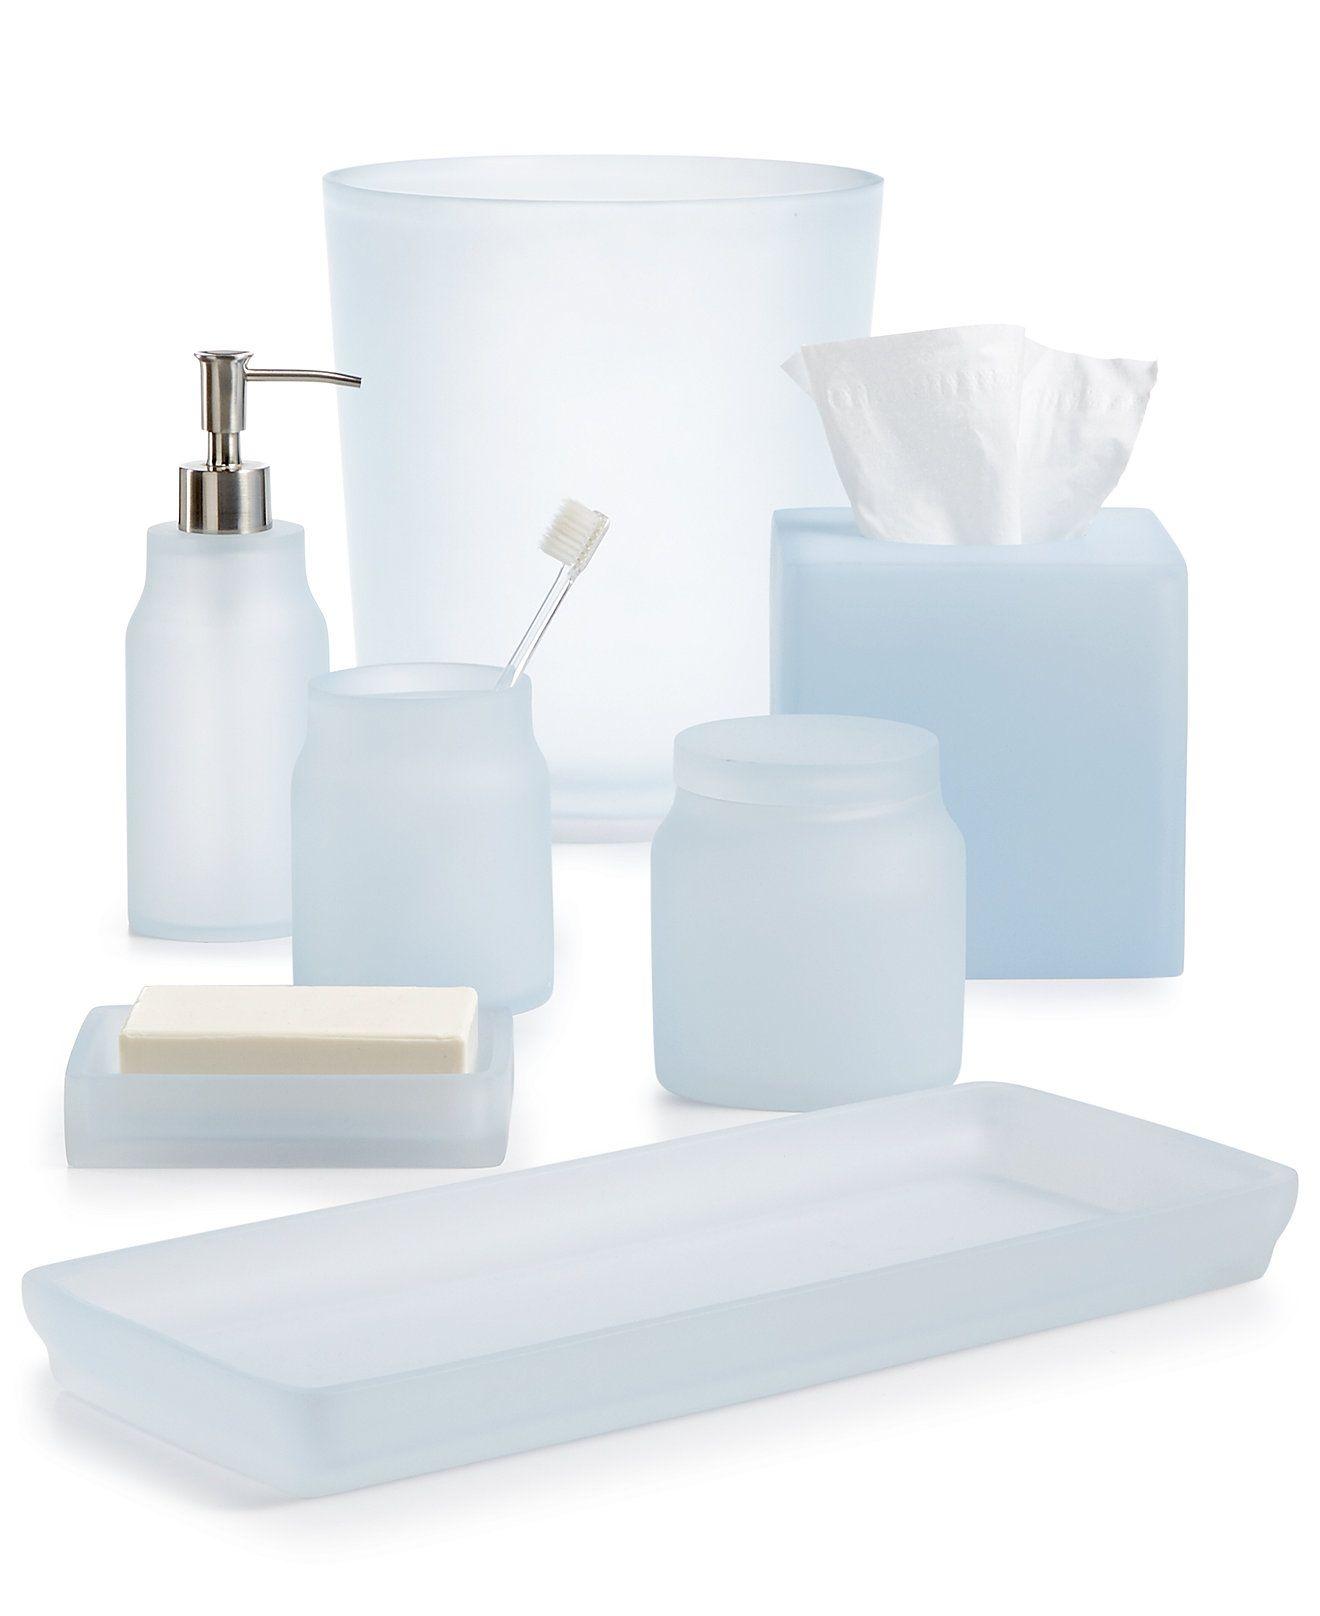 Martha Stewart Collection Frosted Powder Blue Bath Accessories